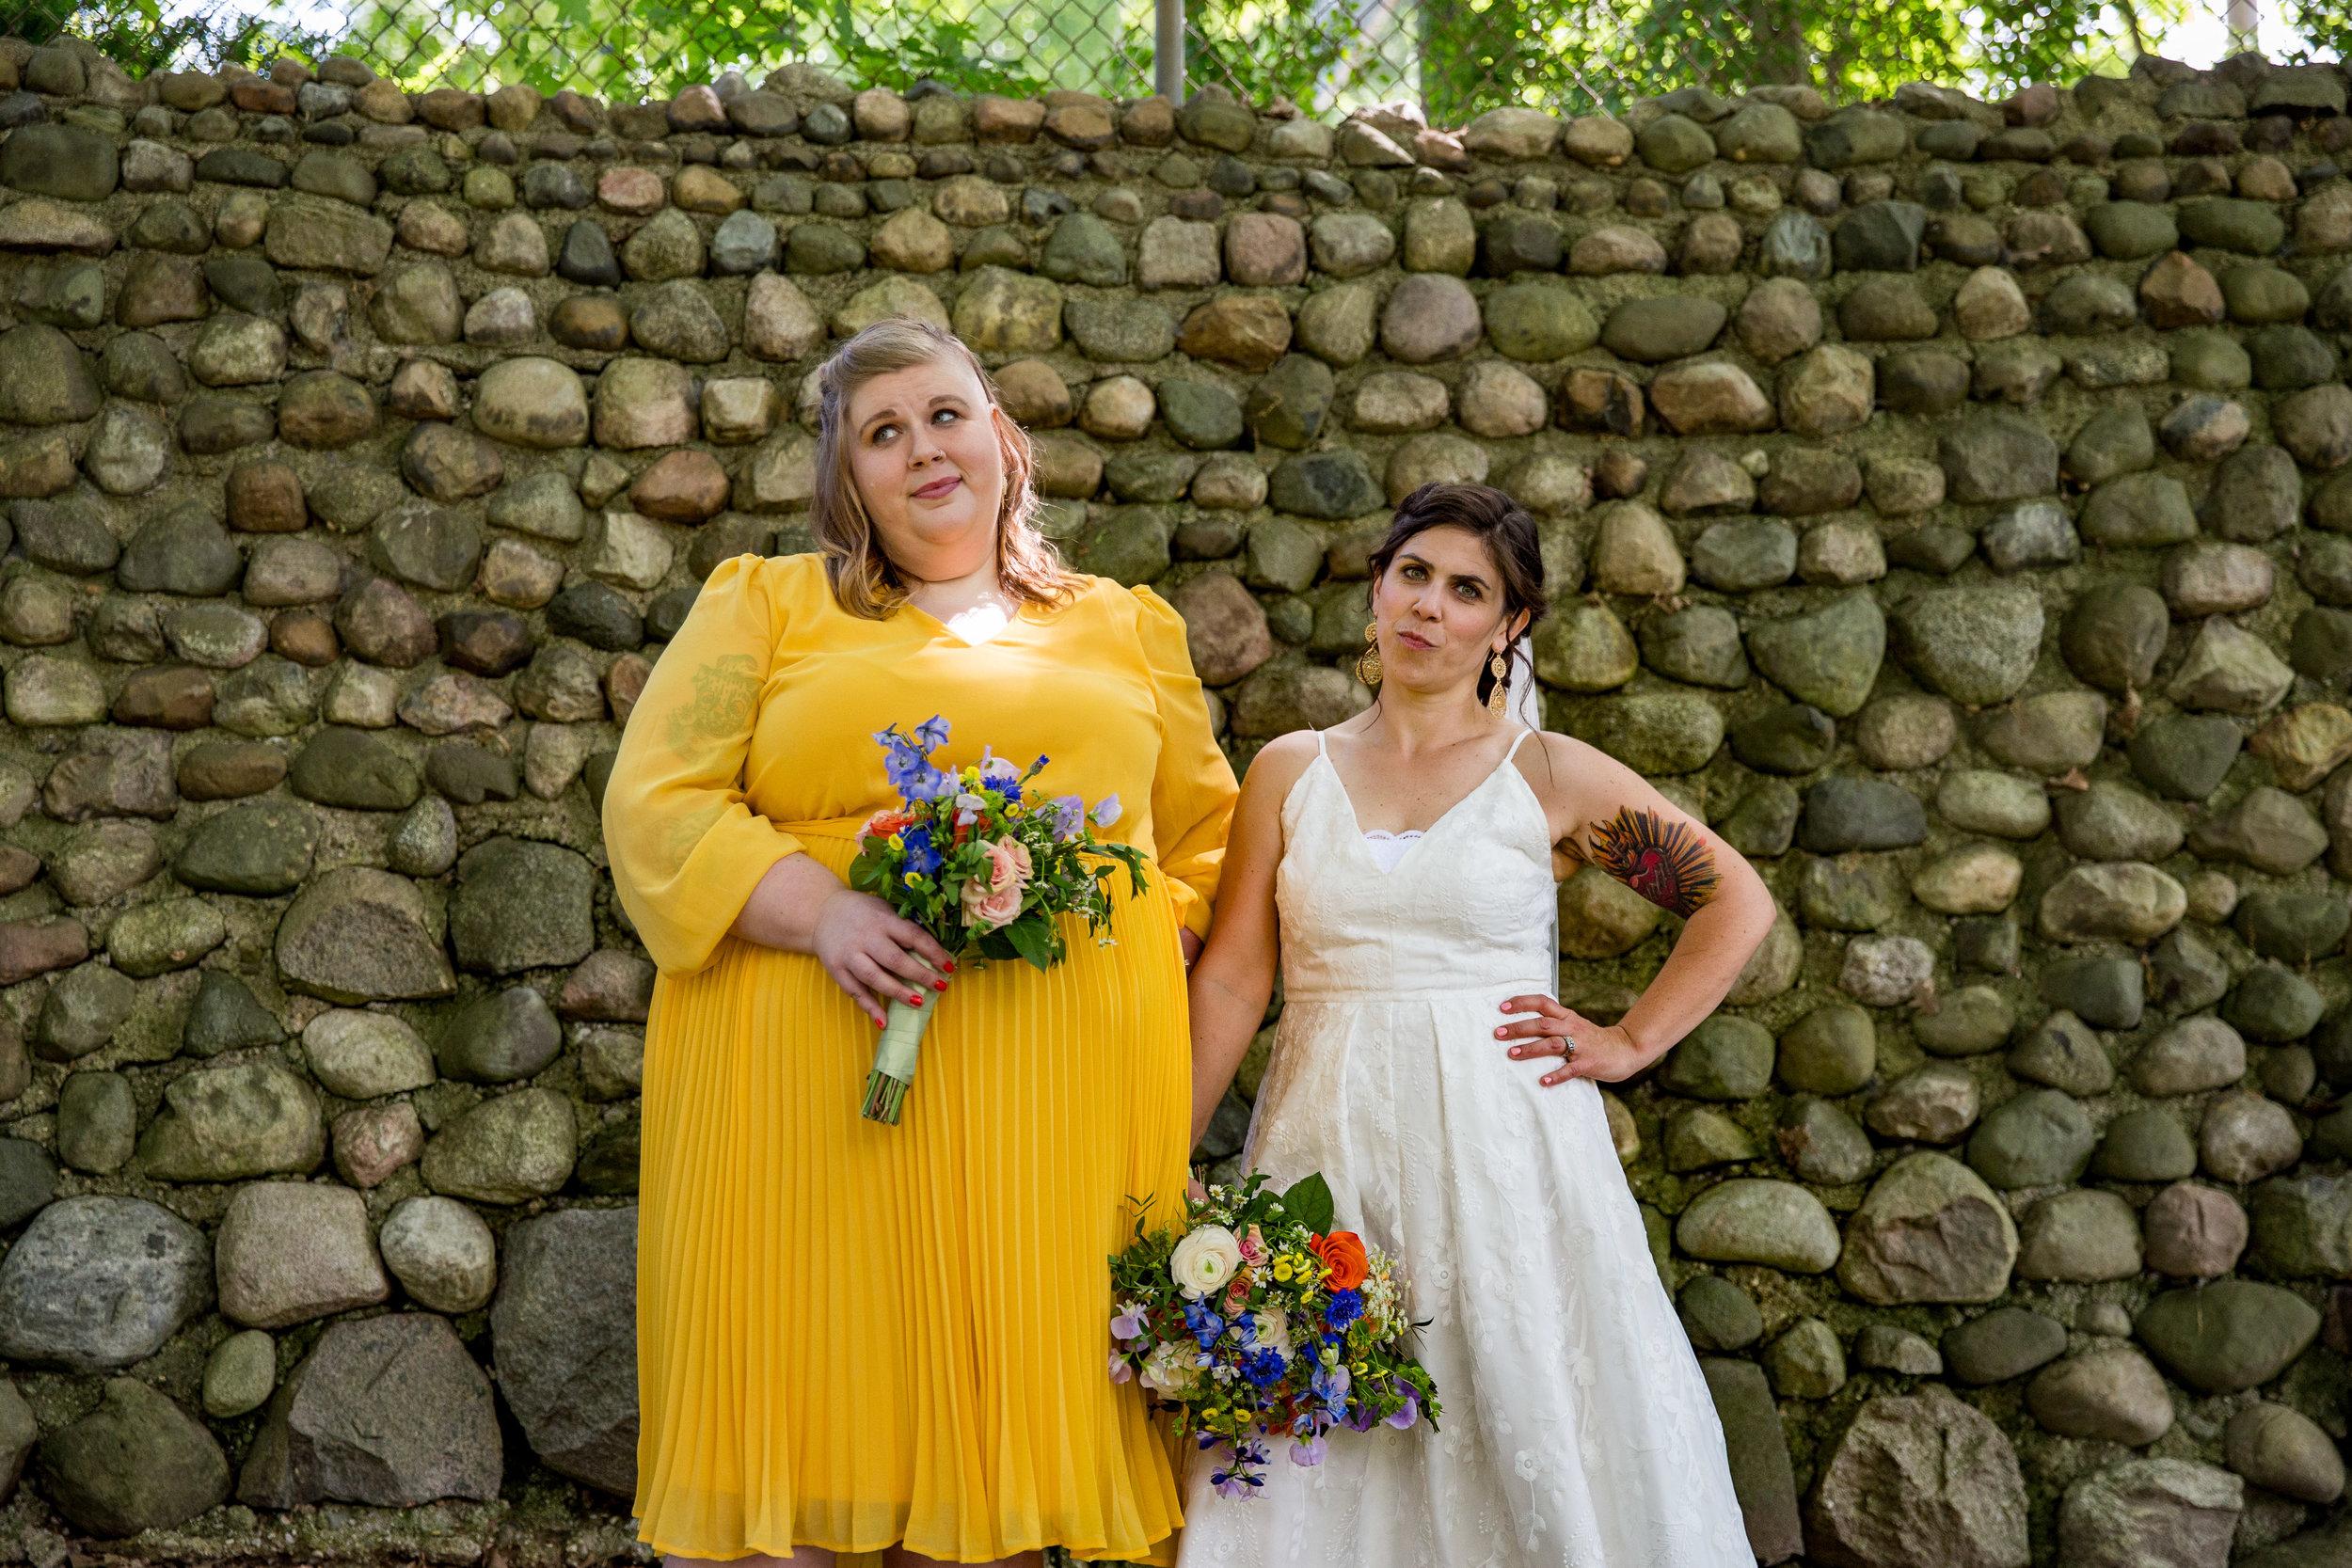 Natalie and Dallas Mooney Wedding 6-8-19_Tania Watt Photography-344.jpg